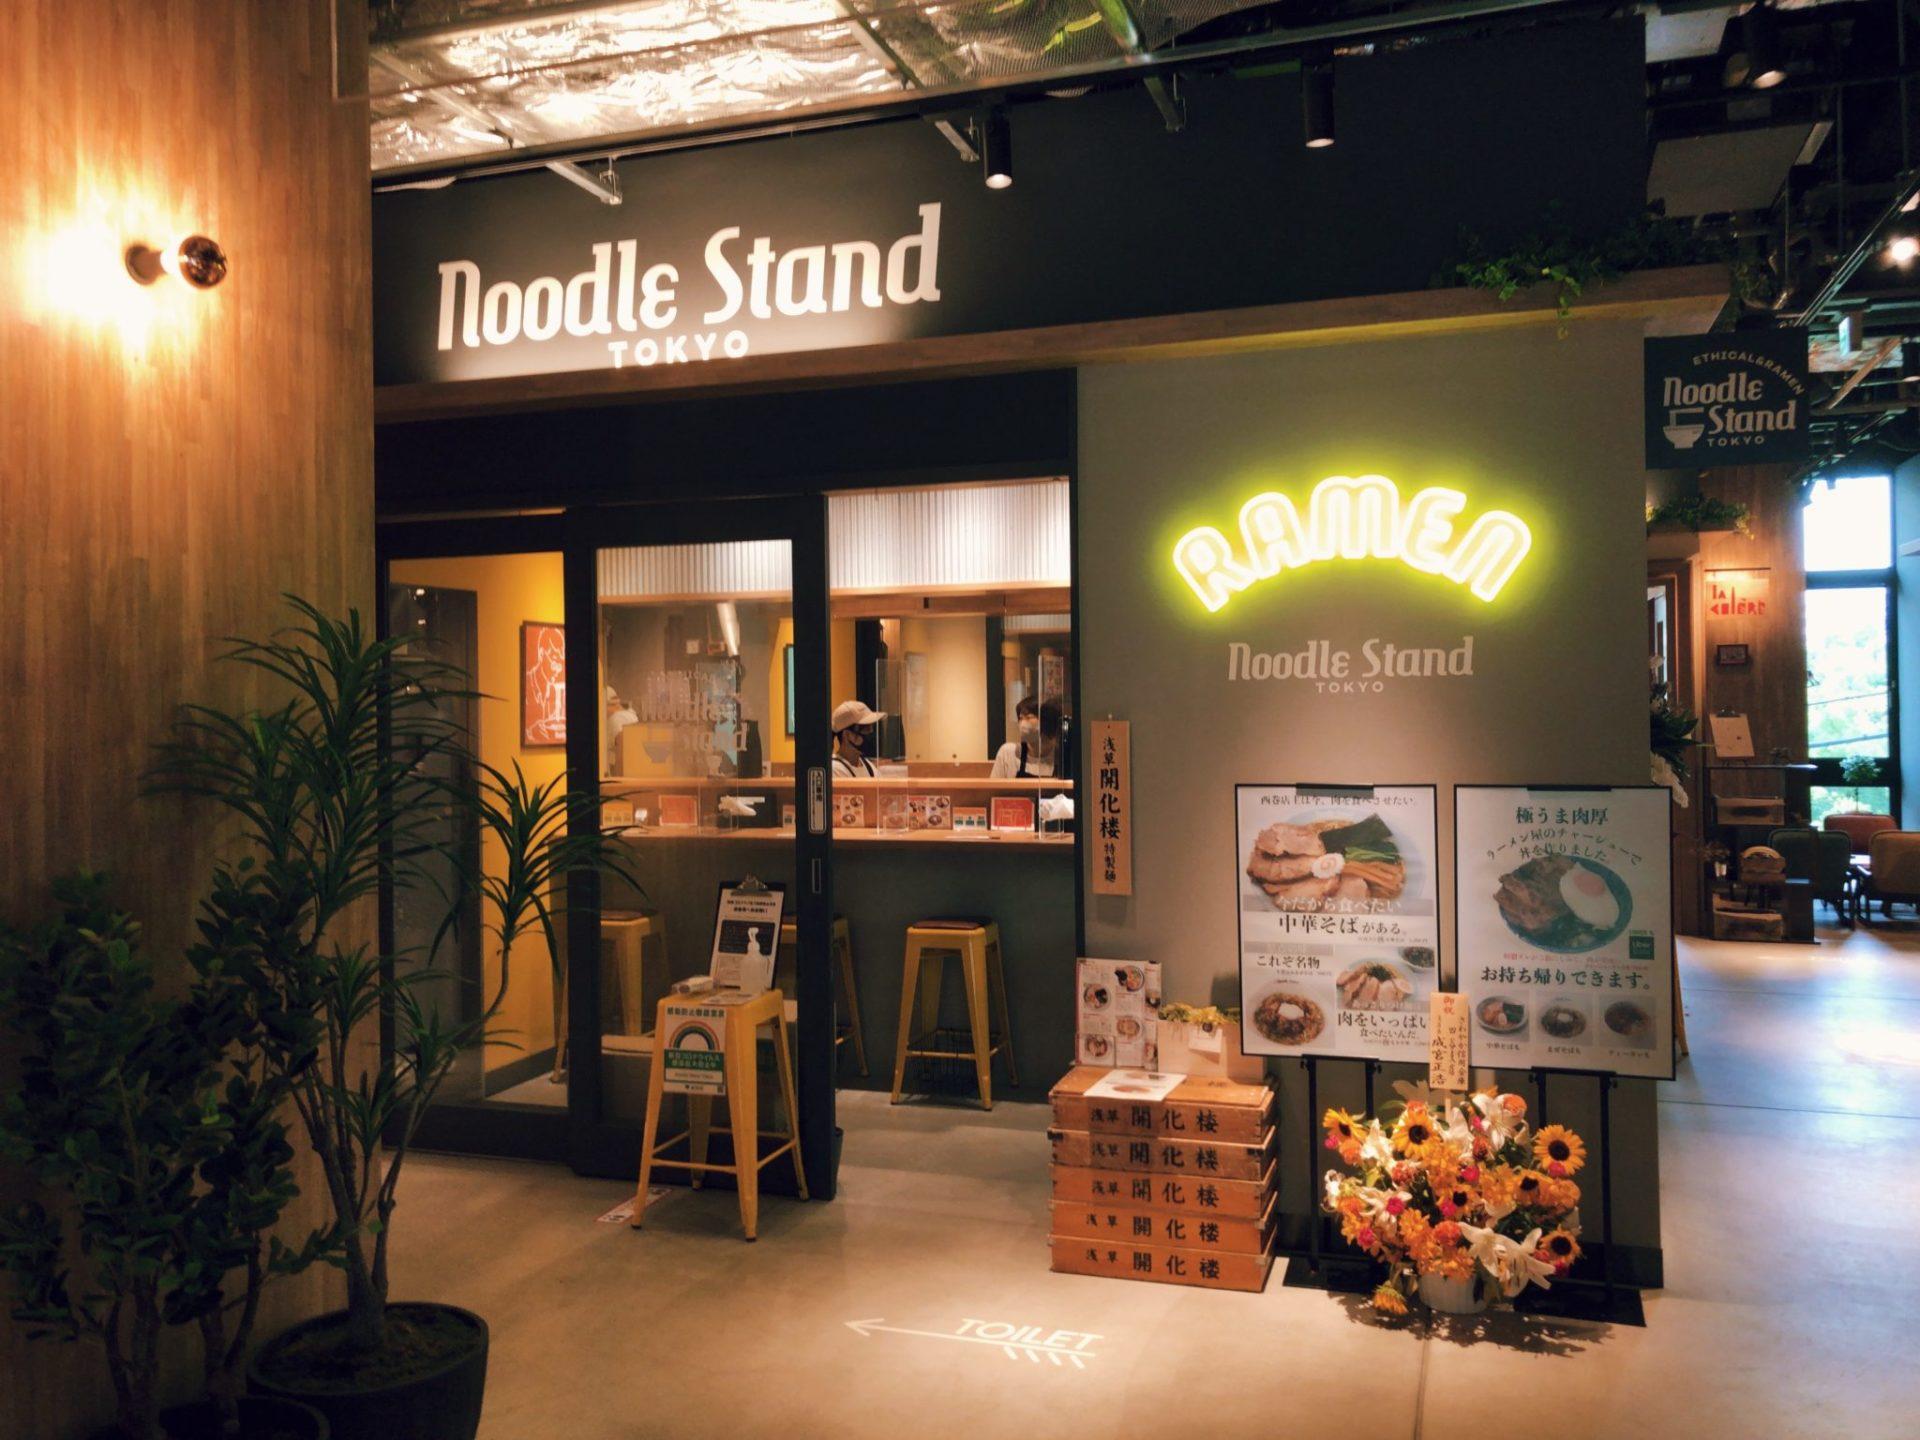 Noodle Stand Tokyo(ヌードルスタンドトウキョウ)の外観